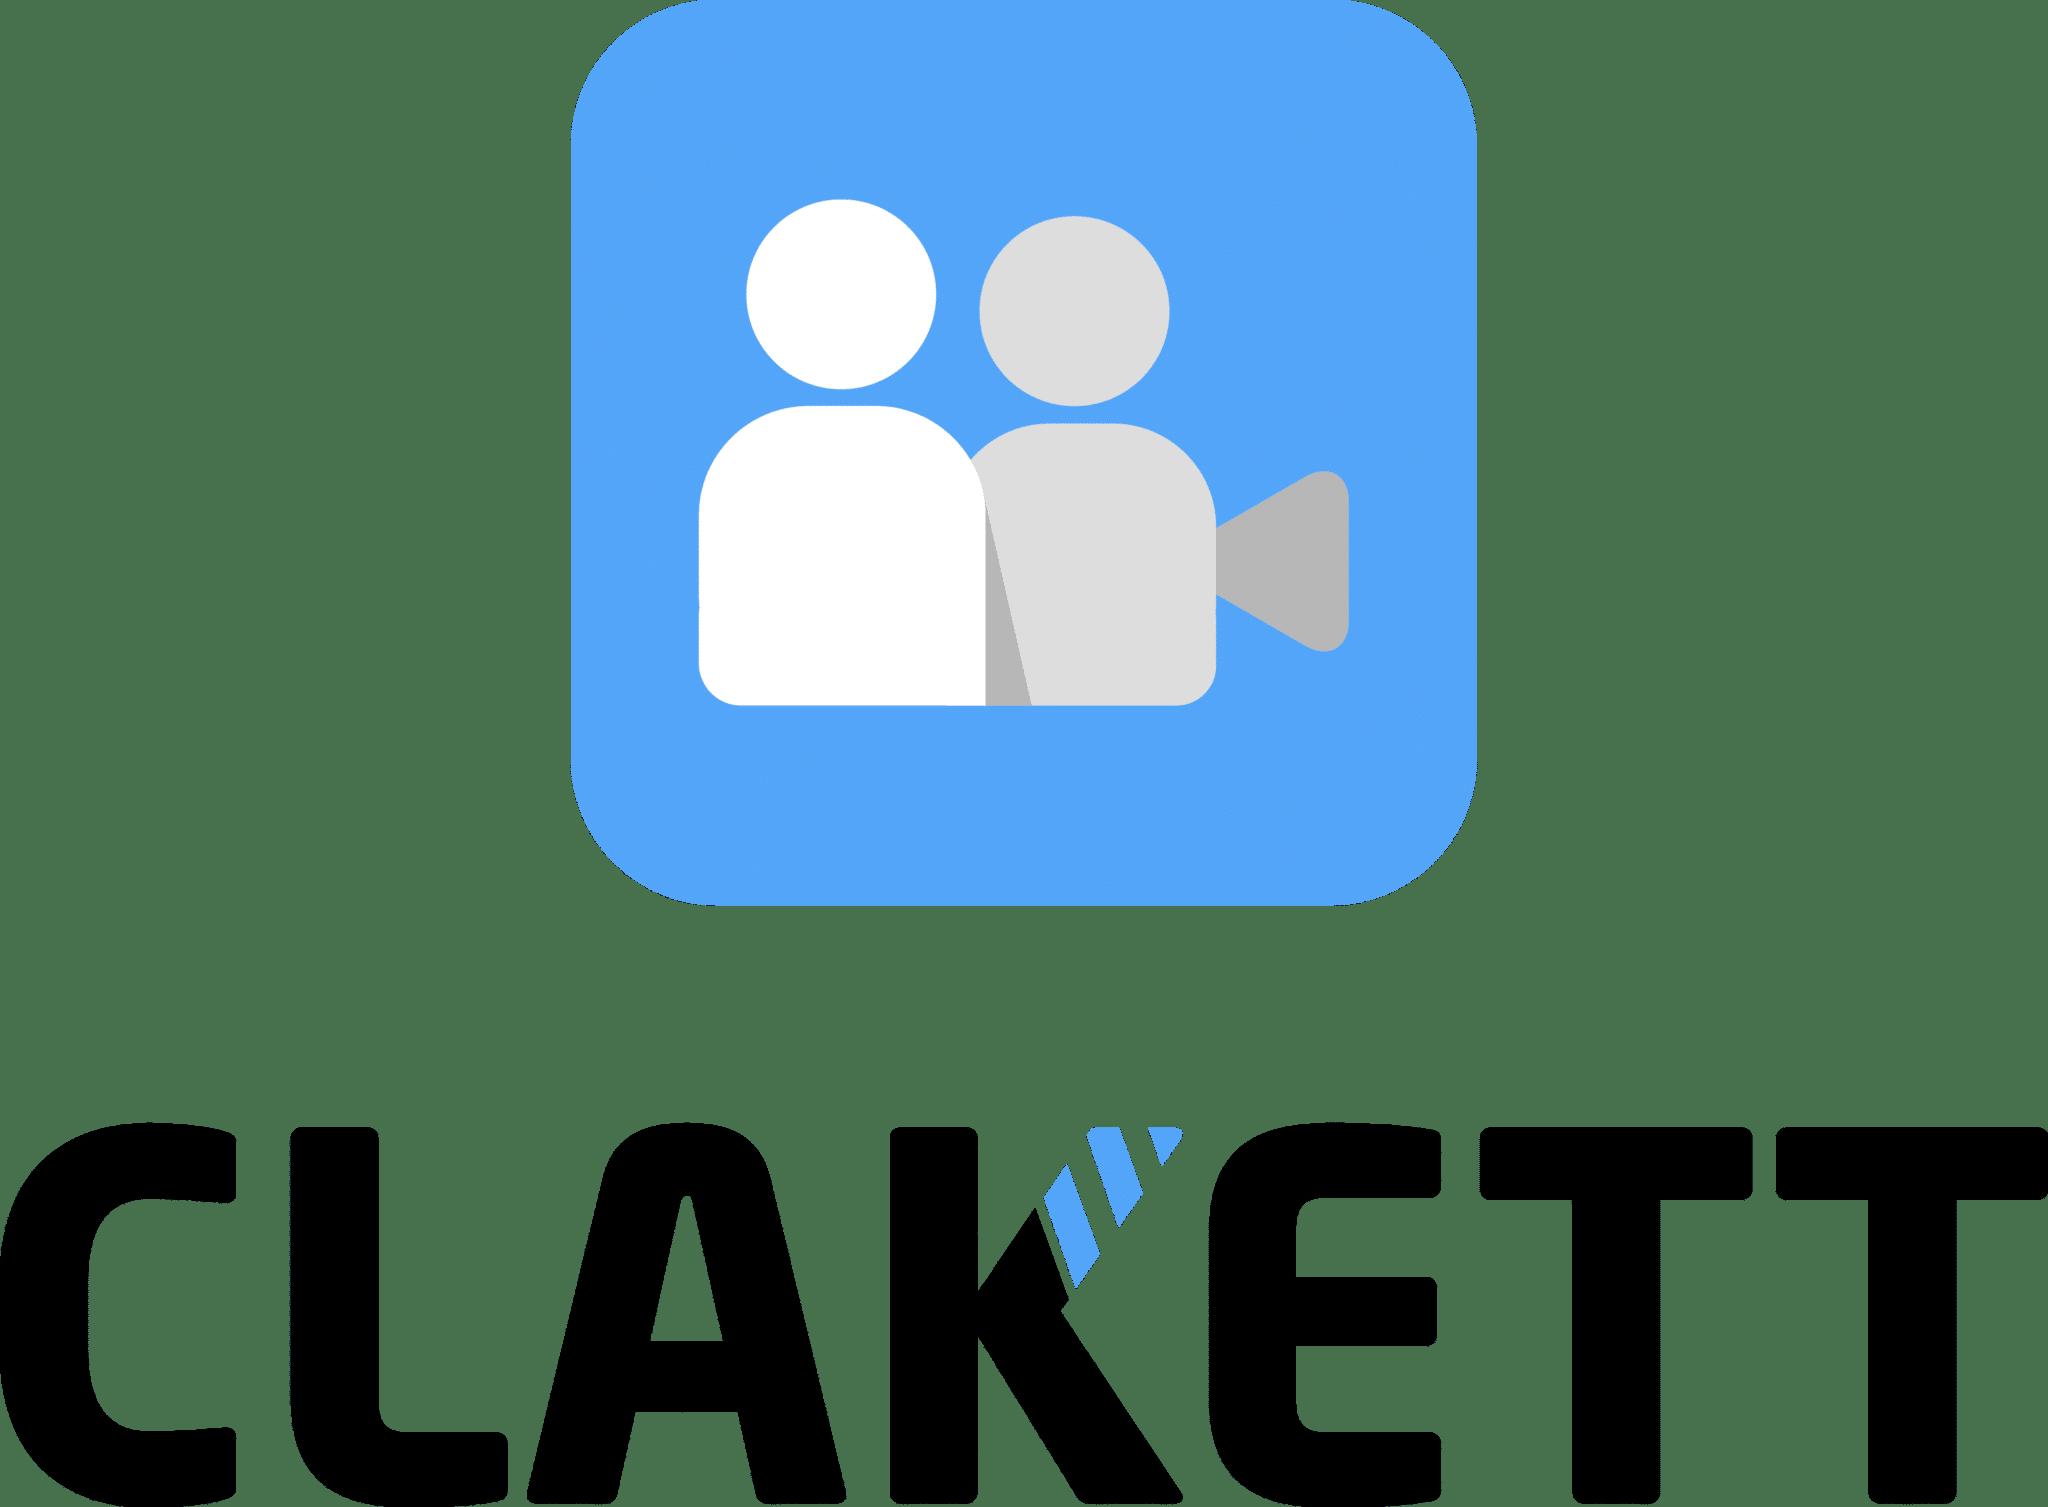 2. Clakett